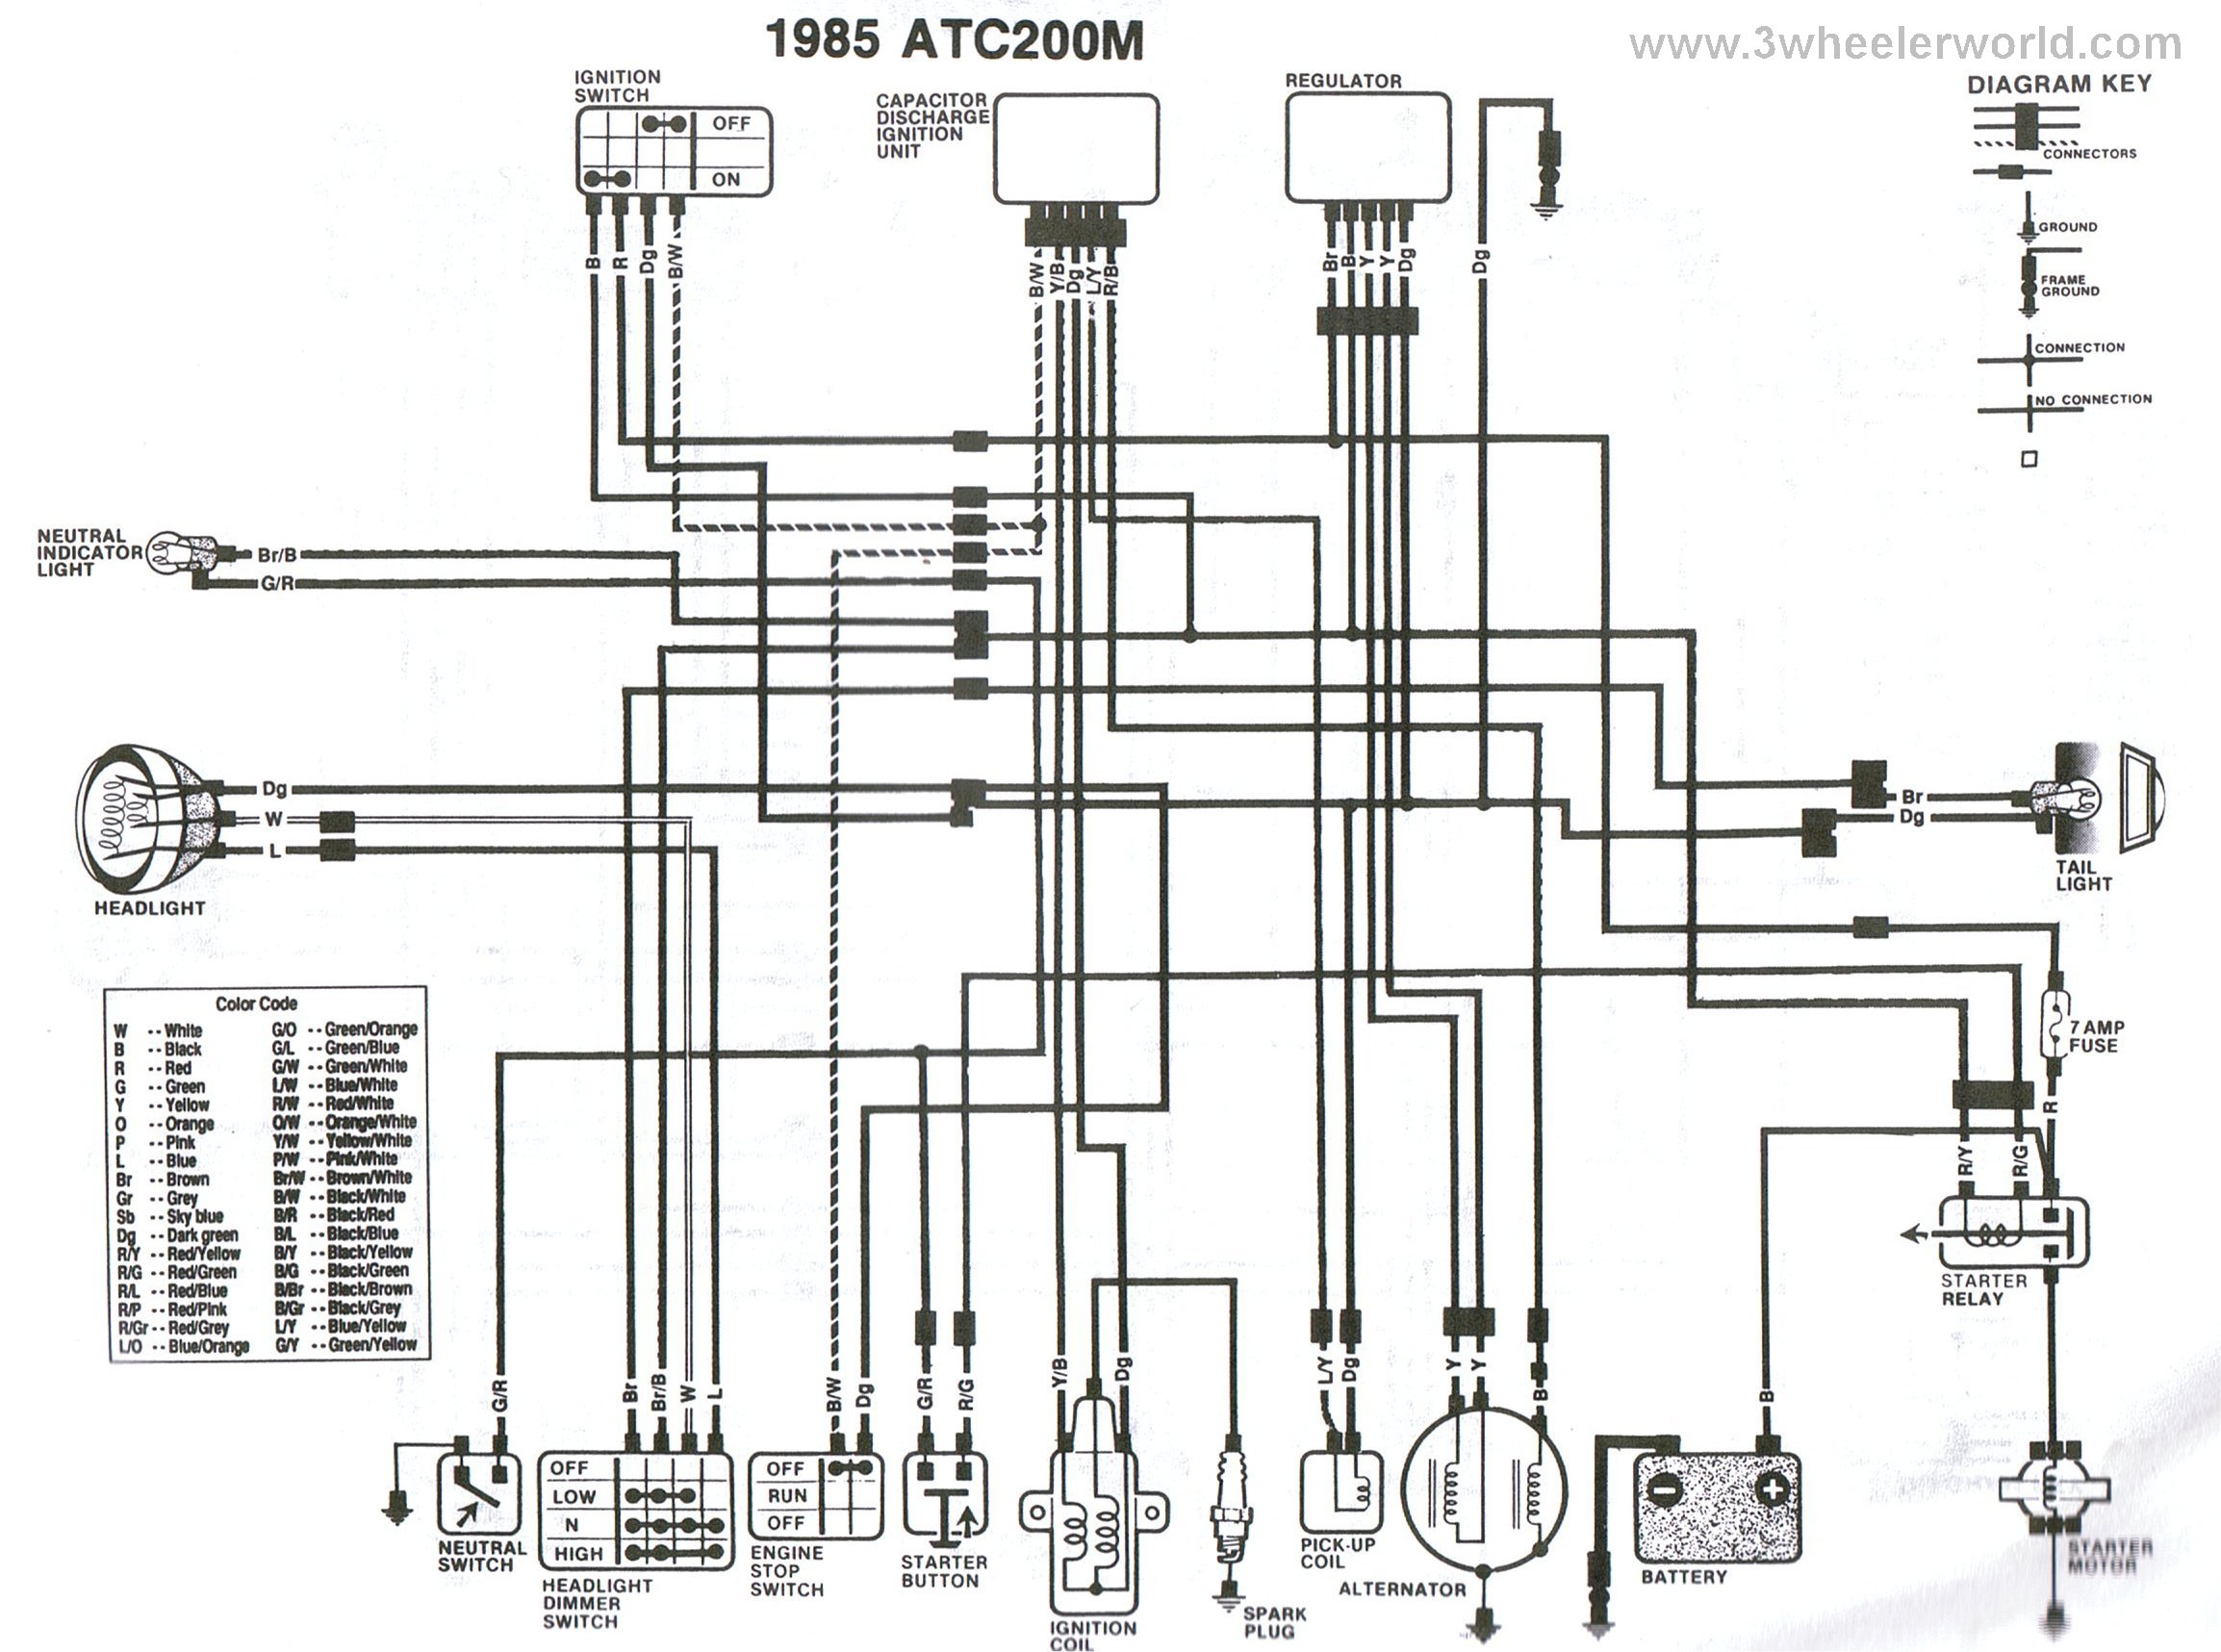 4 wire ignition switch wiring diagram honda honda